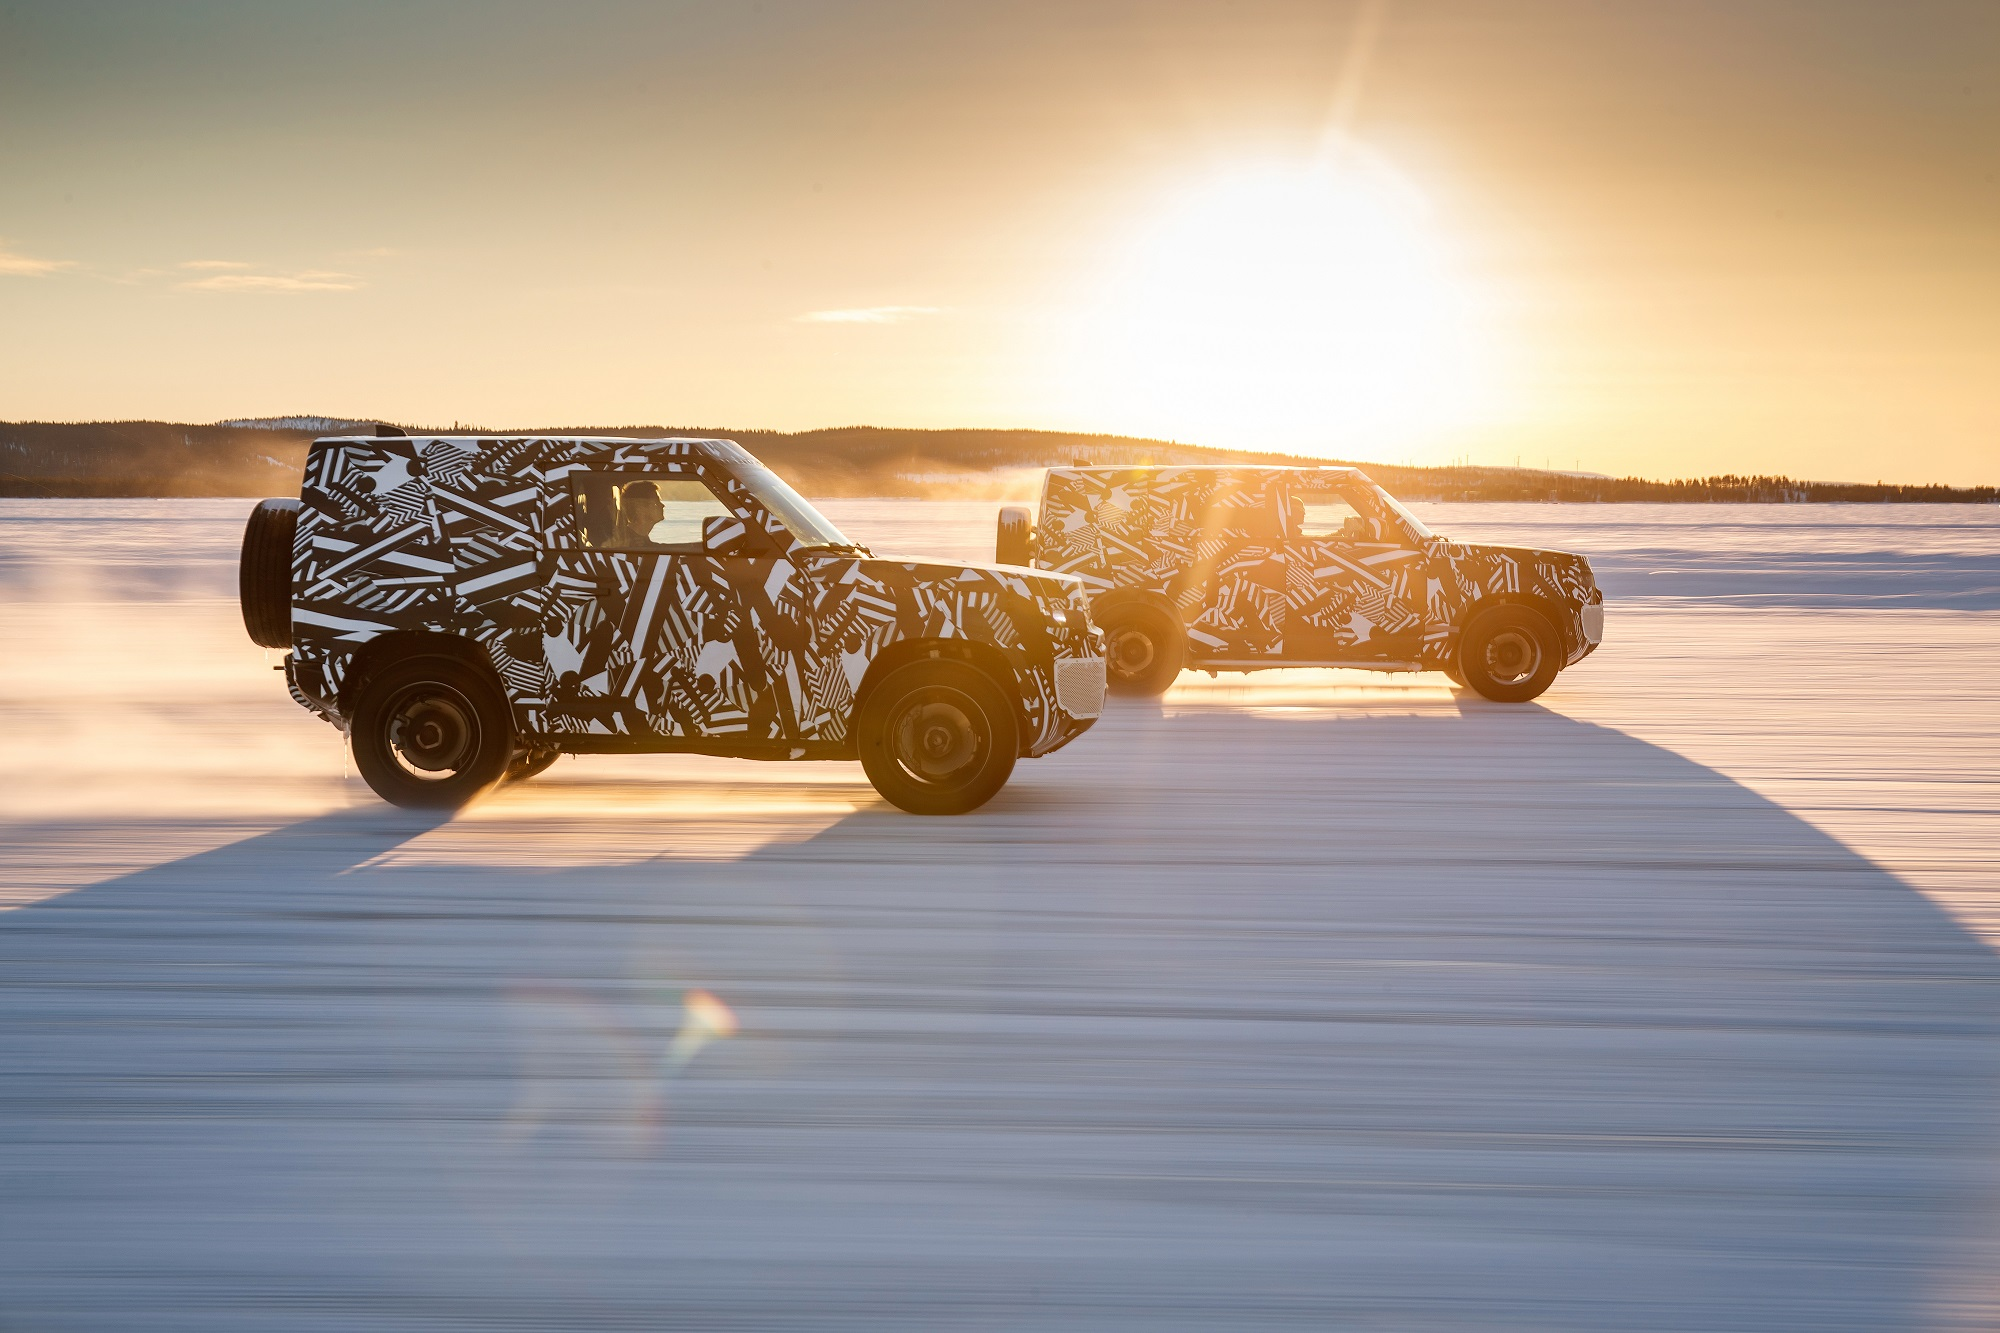 Land Rover Defender Tusk Edition 1.2 Million Kilometers of Development Testing